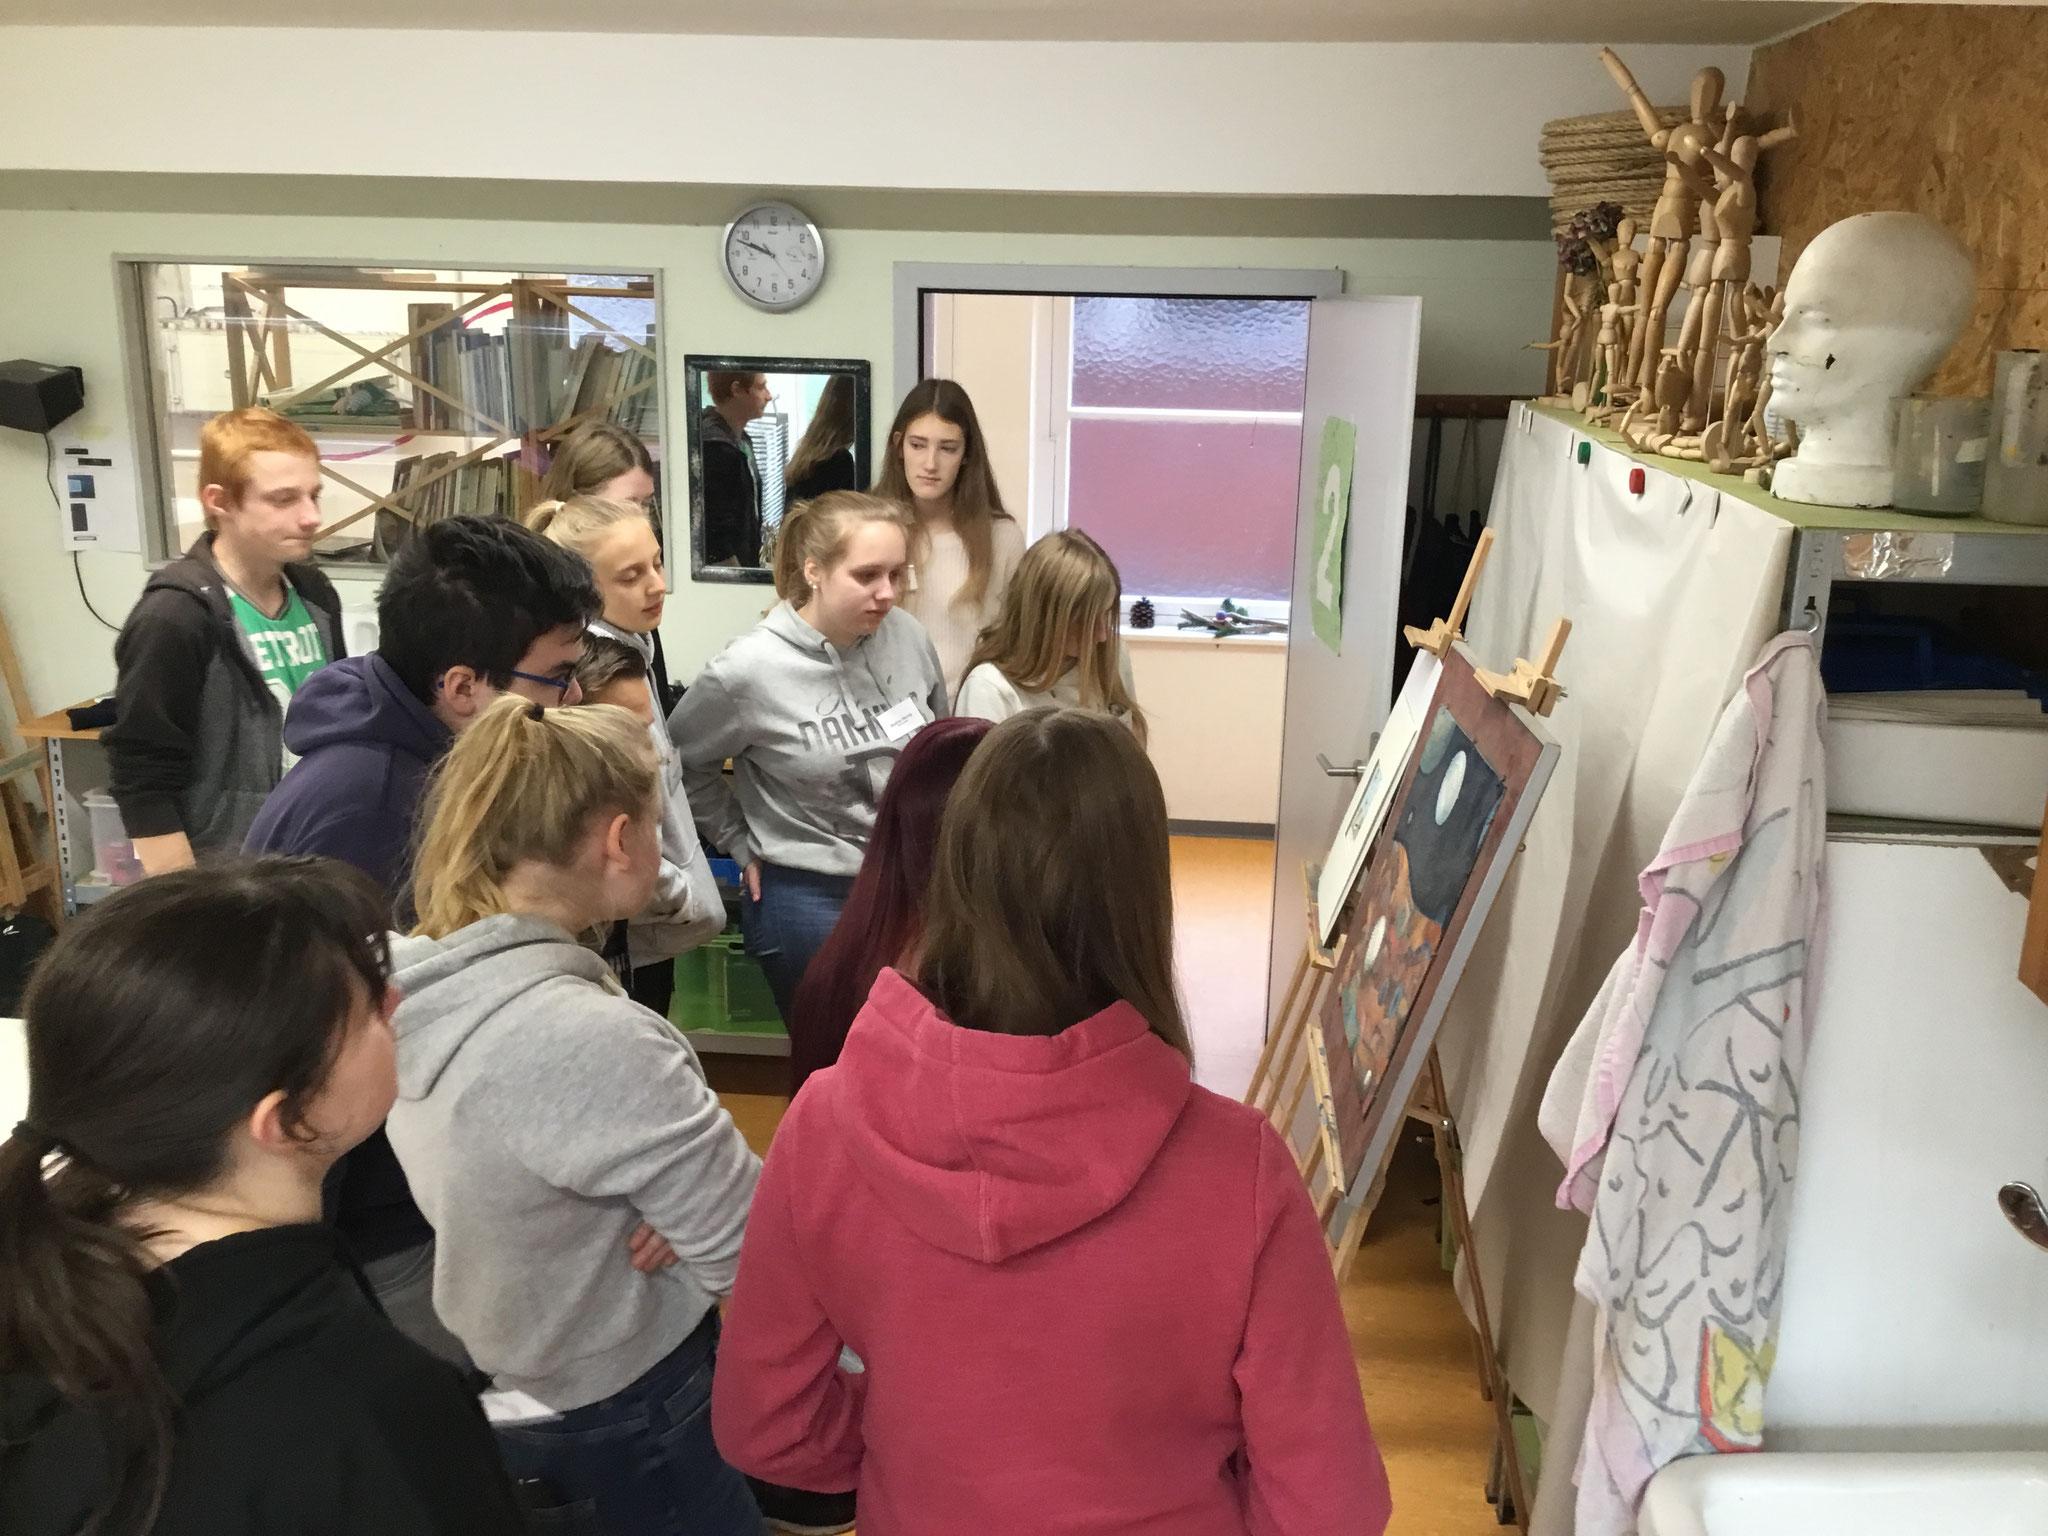 Kunstschule Norden Bildbeschreibung Ricardo Fuhrmann